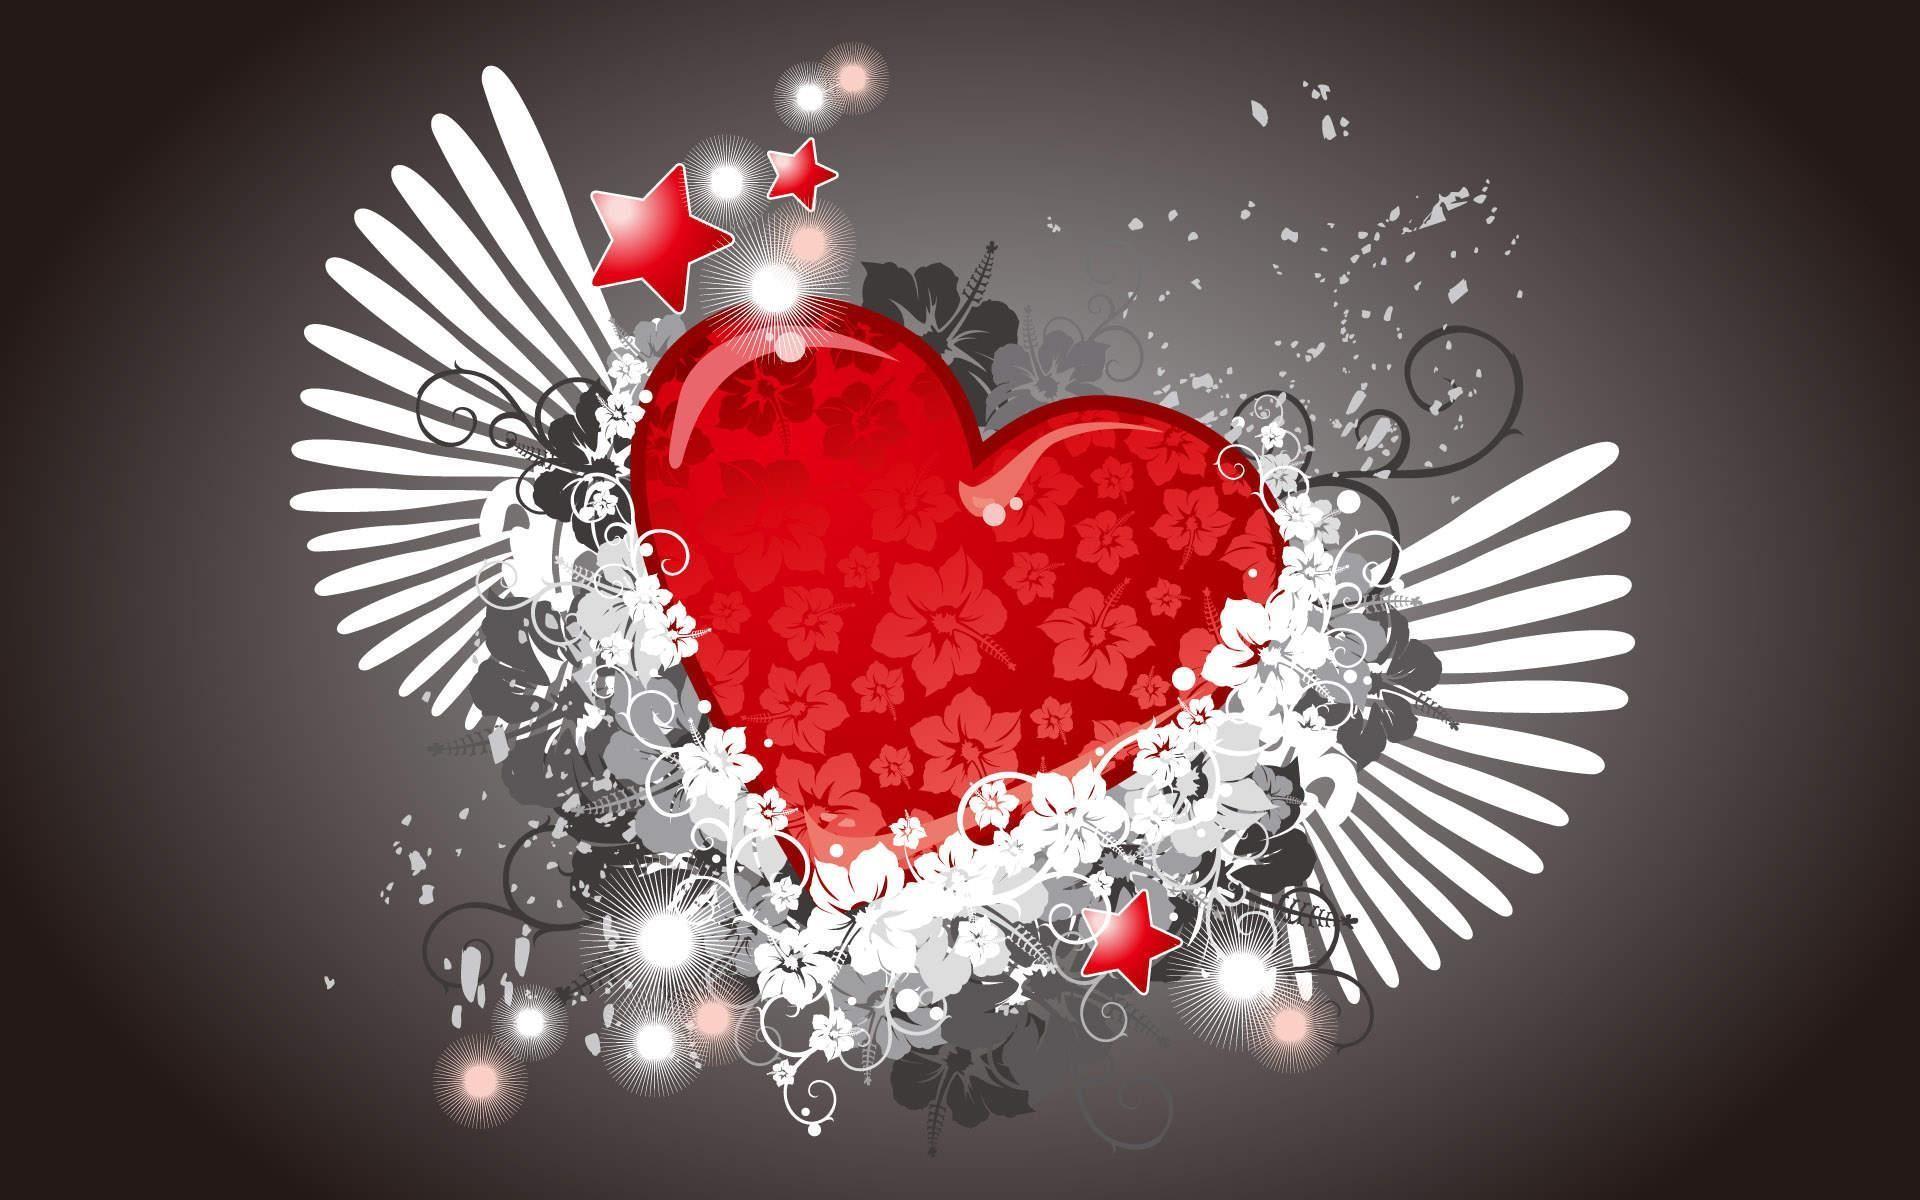 Advance 14 feb Happy <b>Valentines</b> Day Whatsapp Dp Images